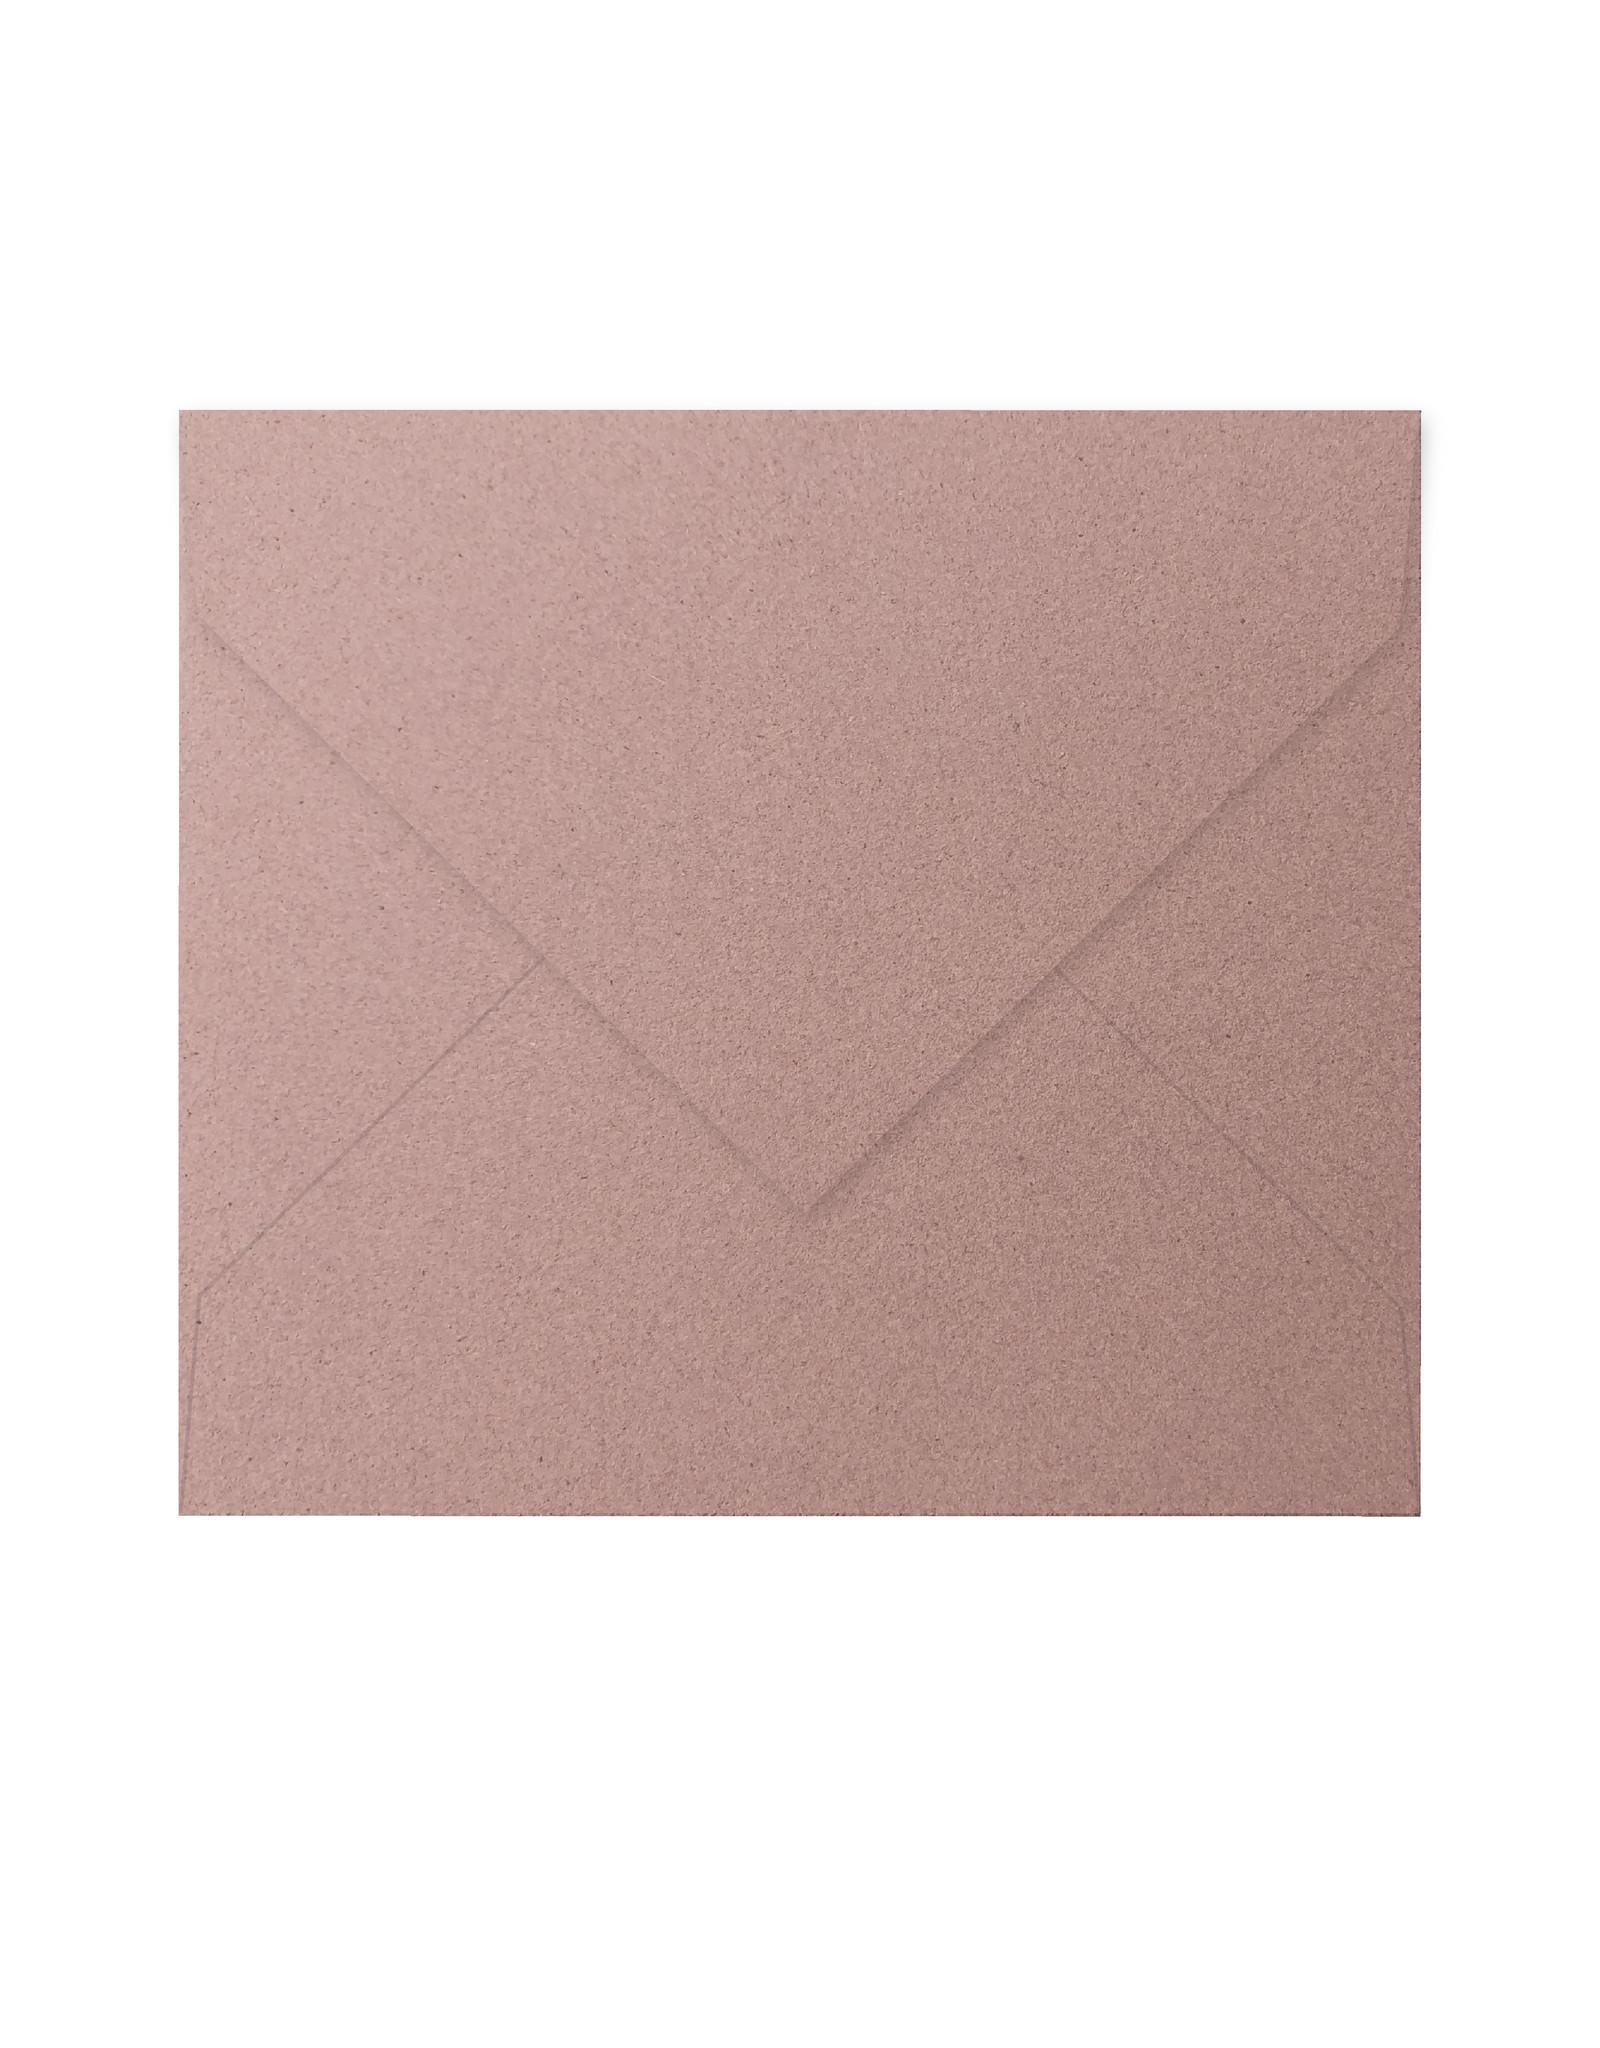 Enveloppe eco amandel - CR03